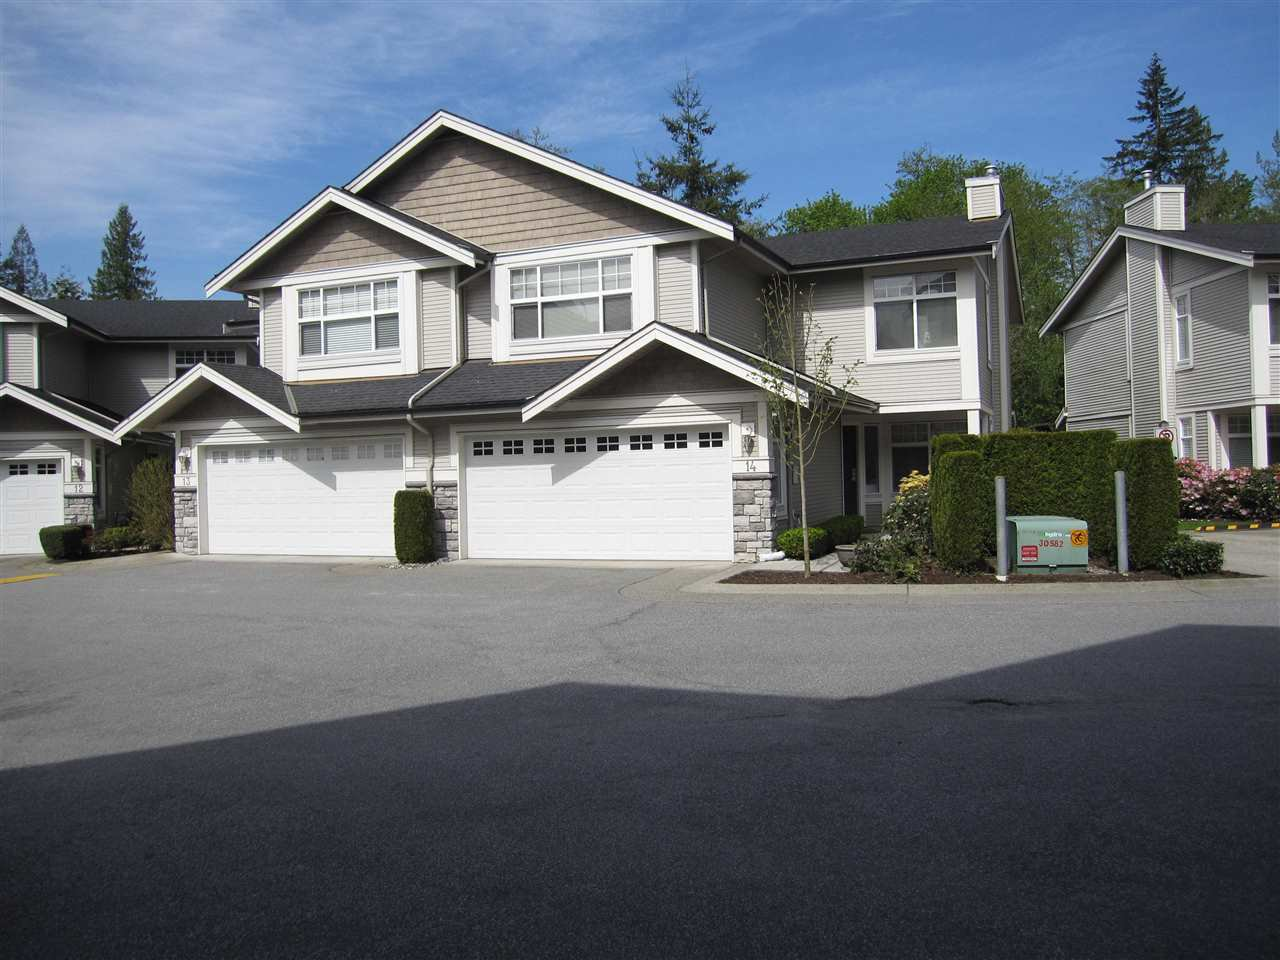 Main Photo: 14 23343 KANAKA WAY in Maple Ridge: Cottonwood MR Townhouse for sale : MLS®# R2164779